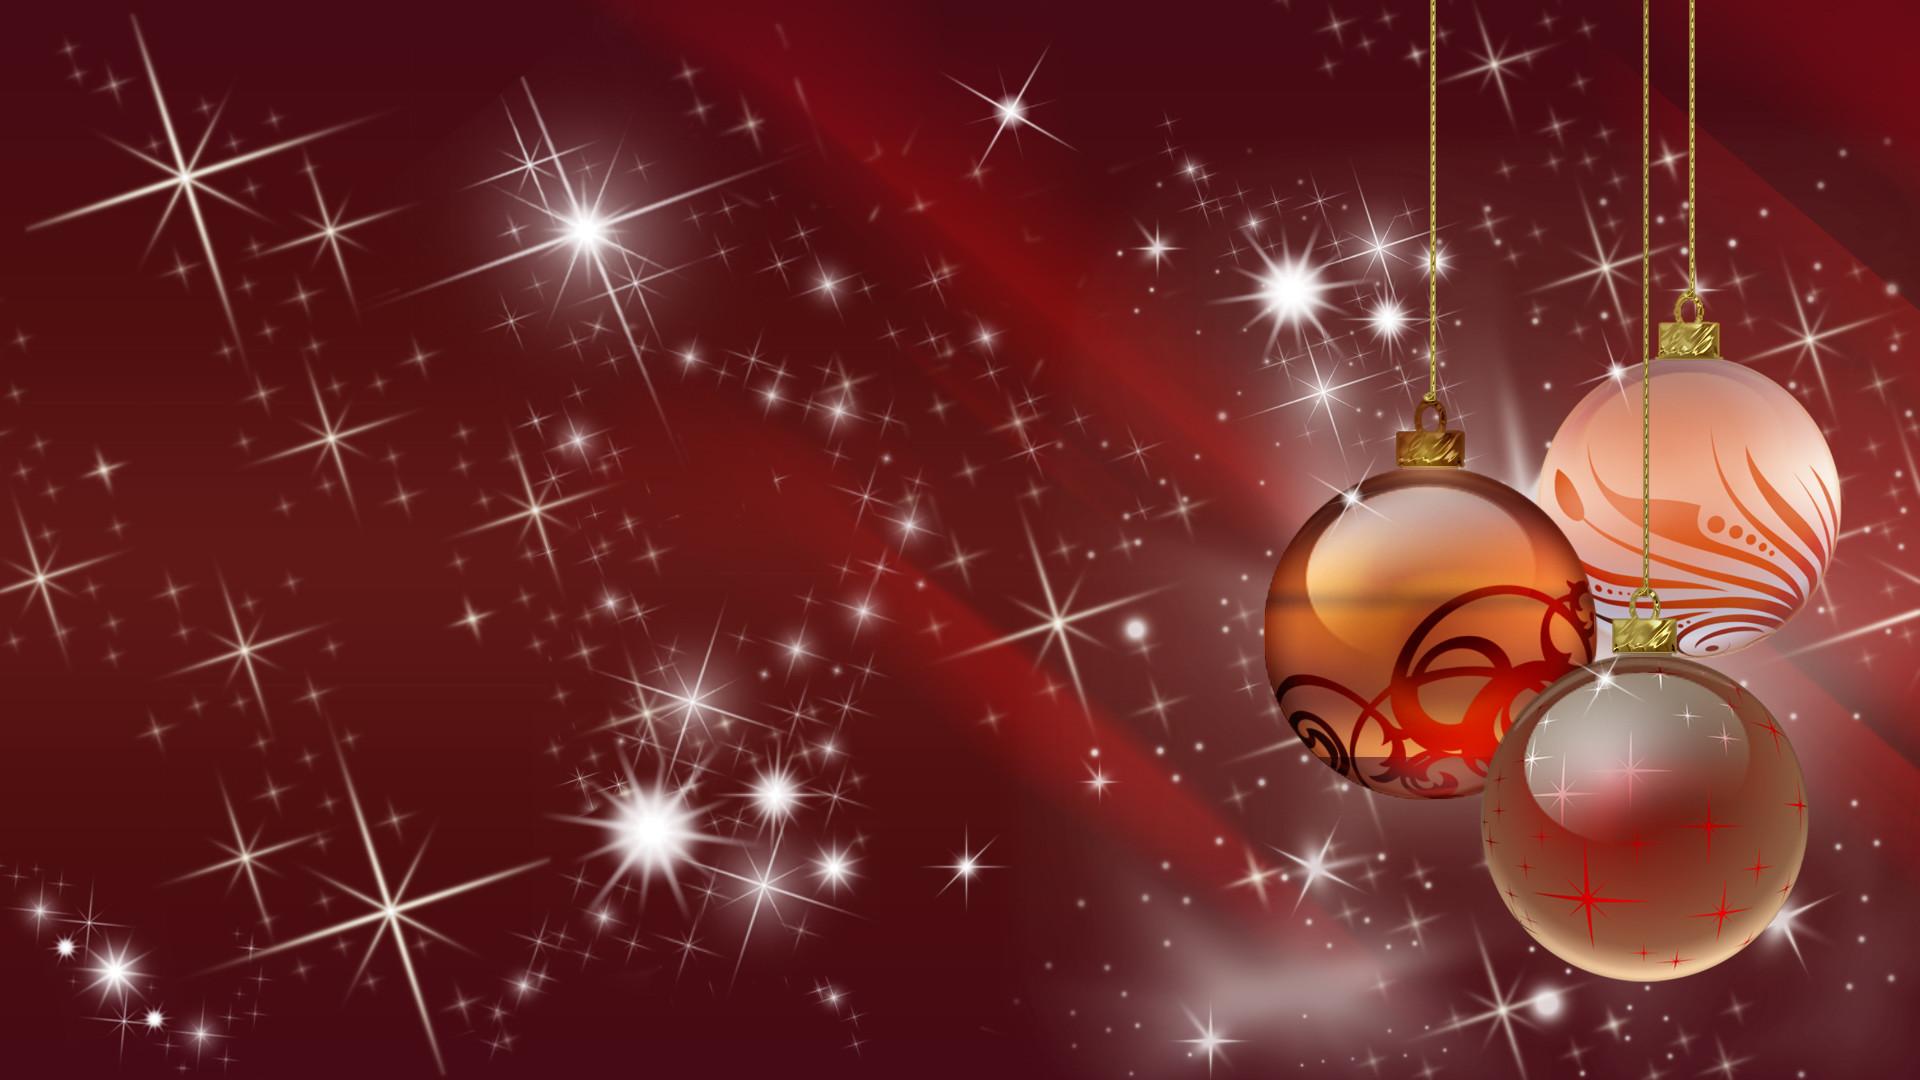 Free Christmas Wallpaper, wallpaper, Free Christmas Wallpaper hd .